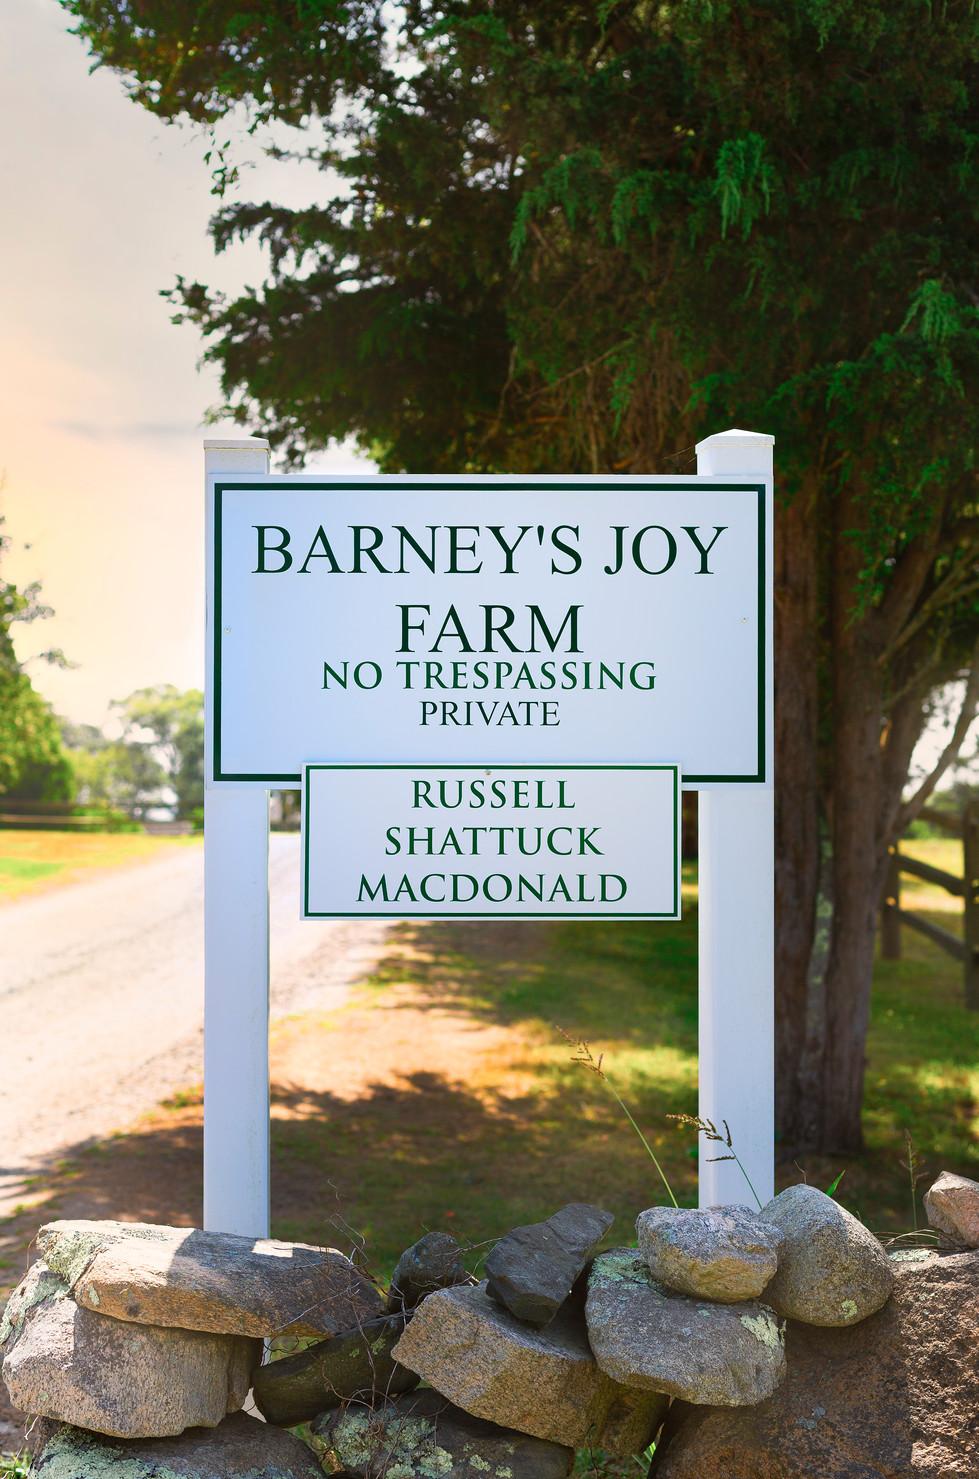 _05A1018 Barneys joy farm sign warmth 2